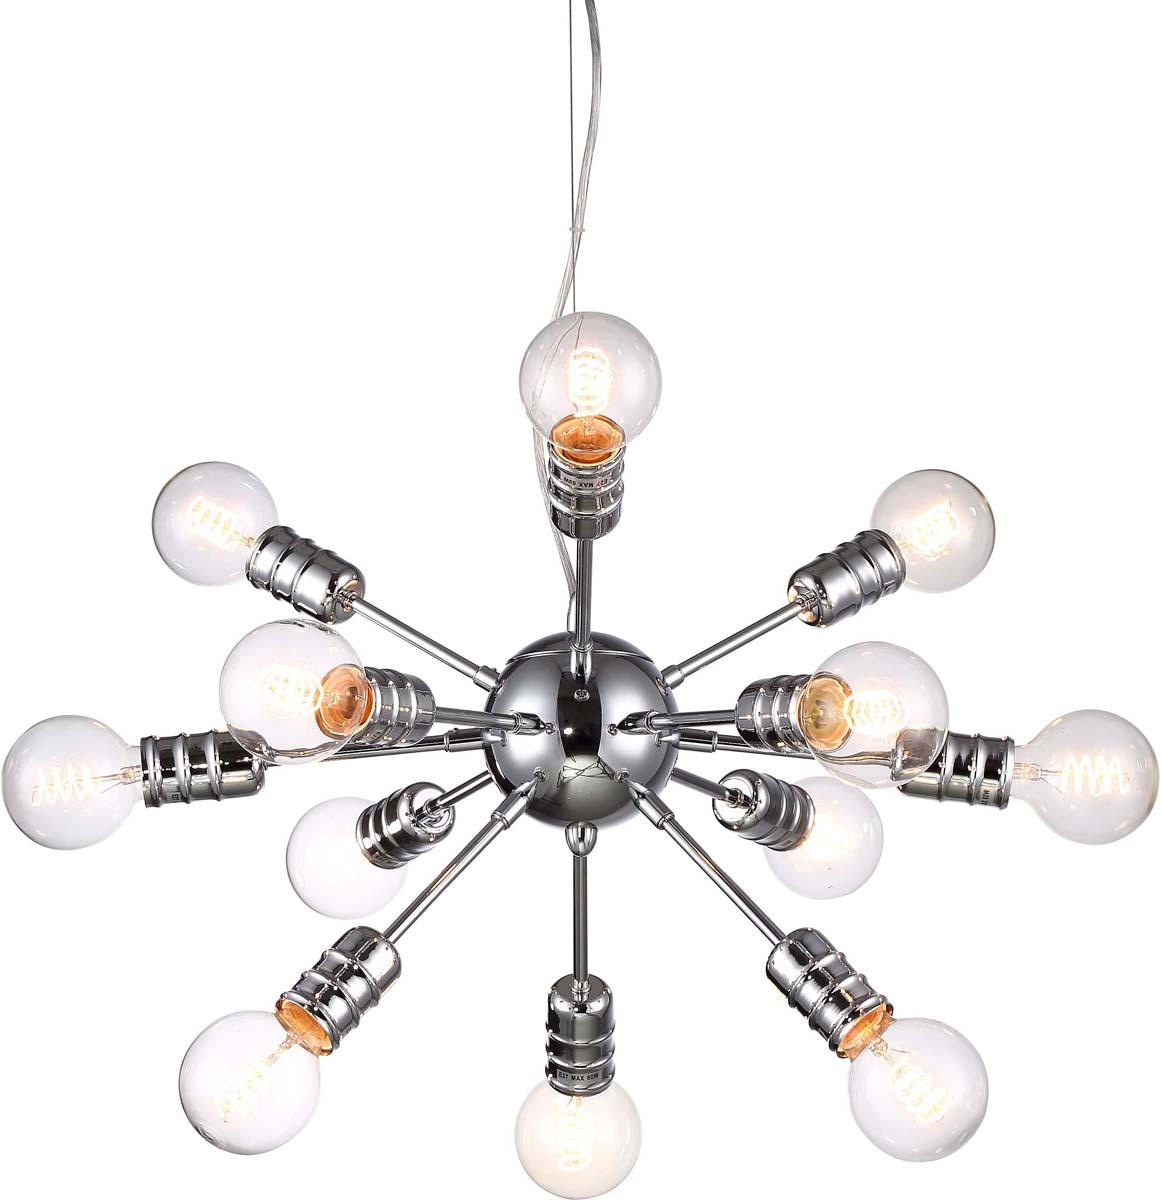 Светильник подвесной Arte Lamp Fuoco, 12 х E27, 60 W. A9265SP-12CCA9265SP-12CC